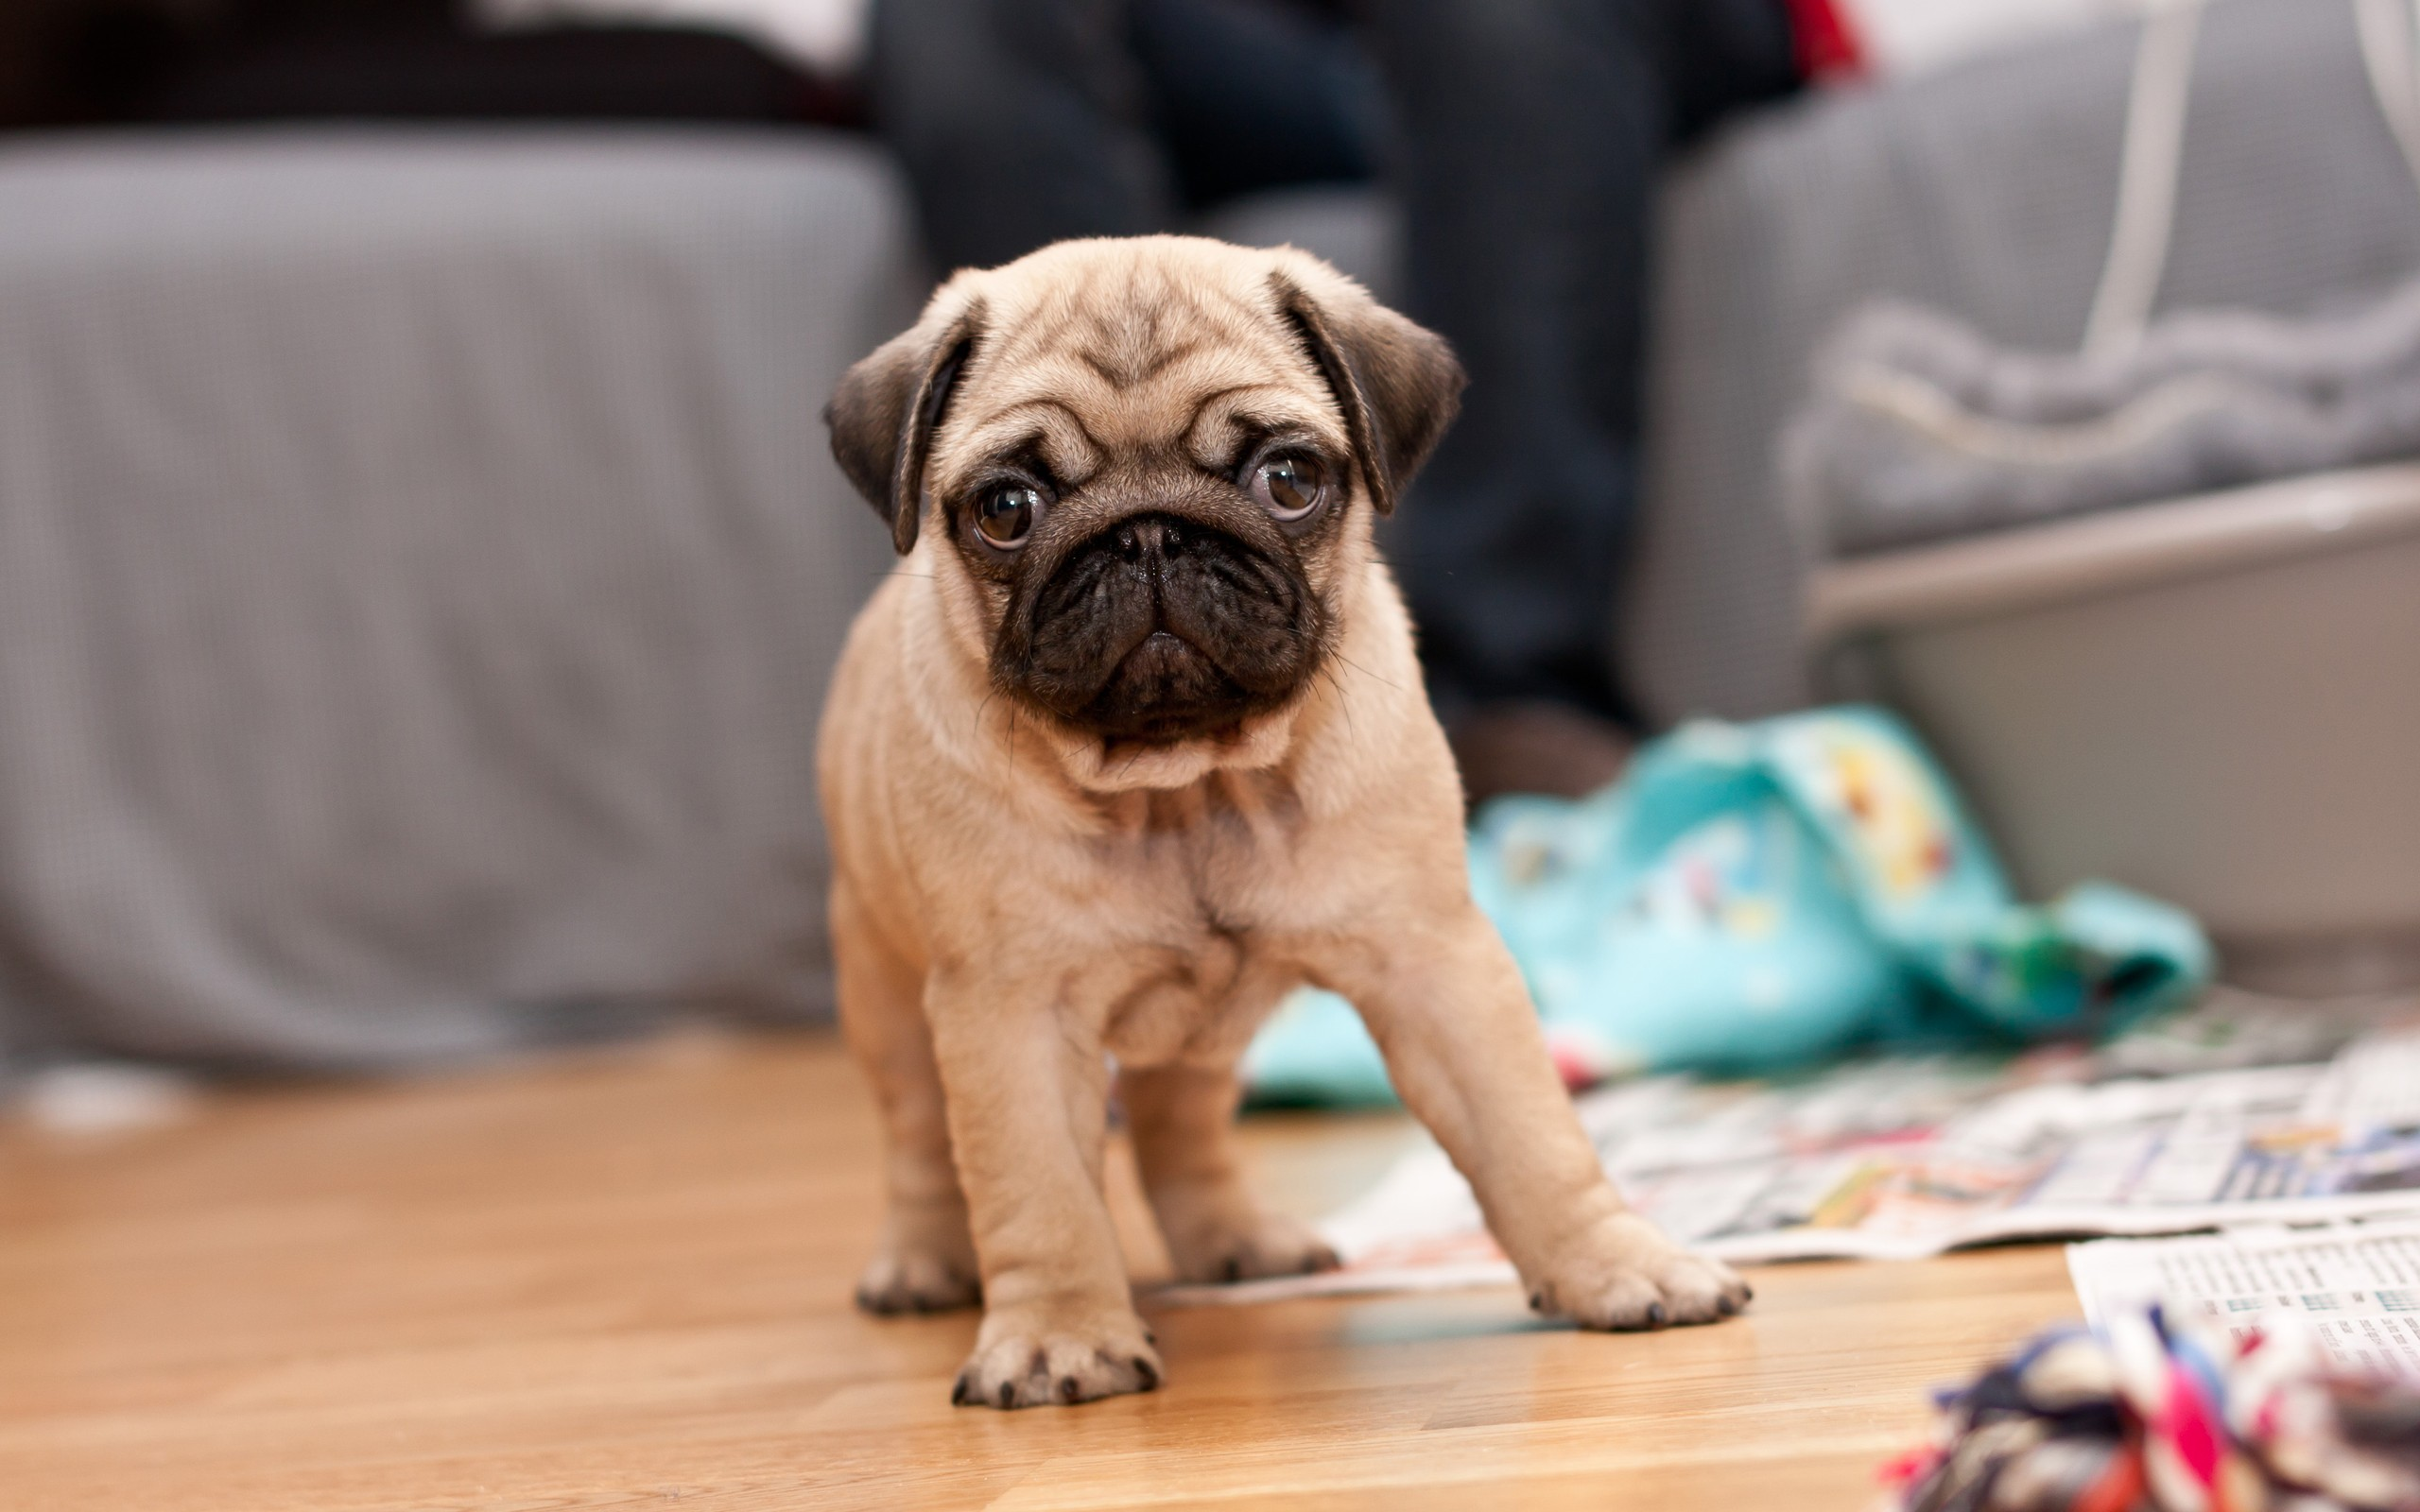 Pug puppy on the floor wallpaper   1070307 2560x1600